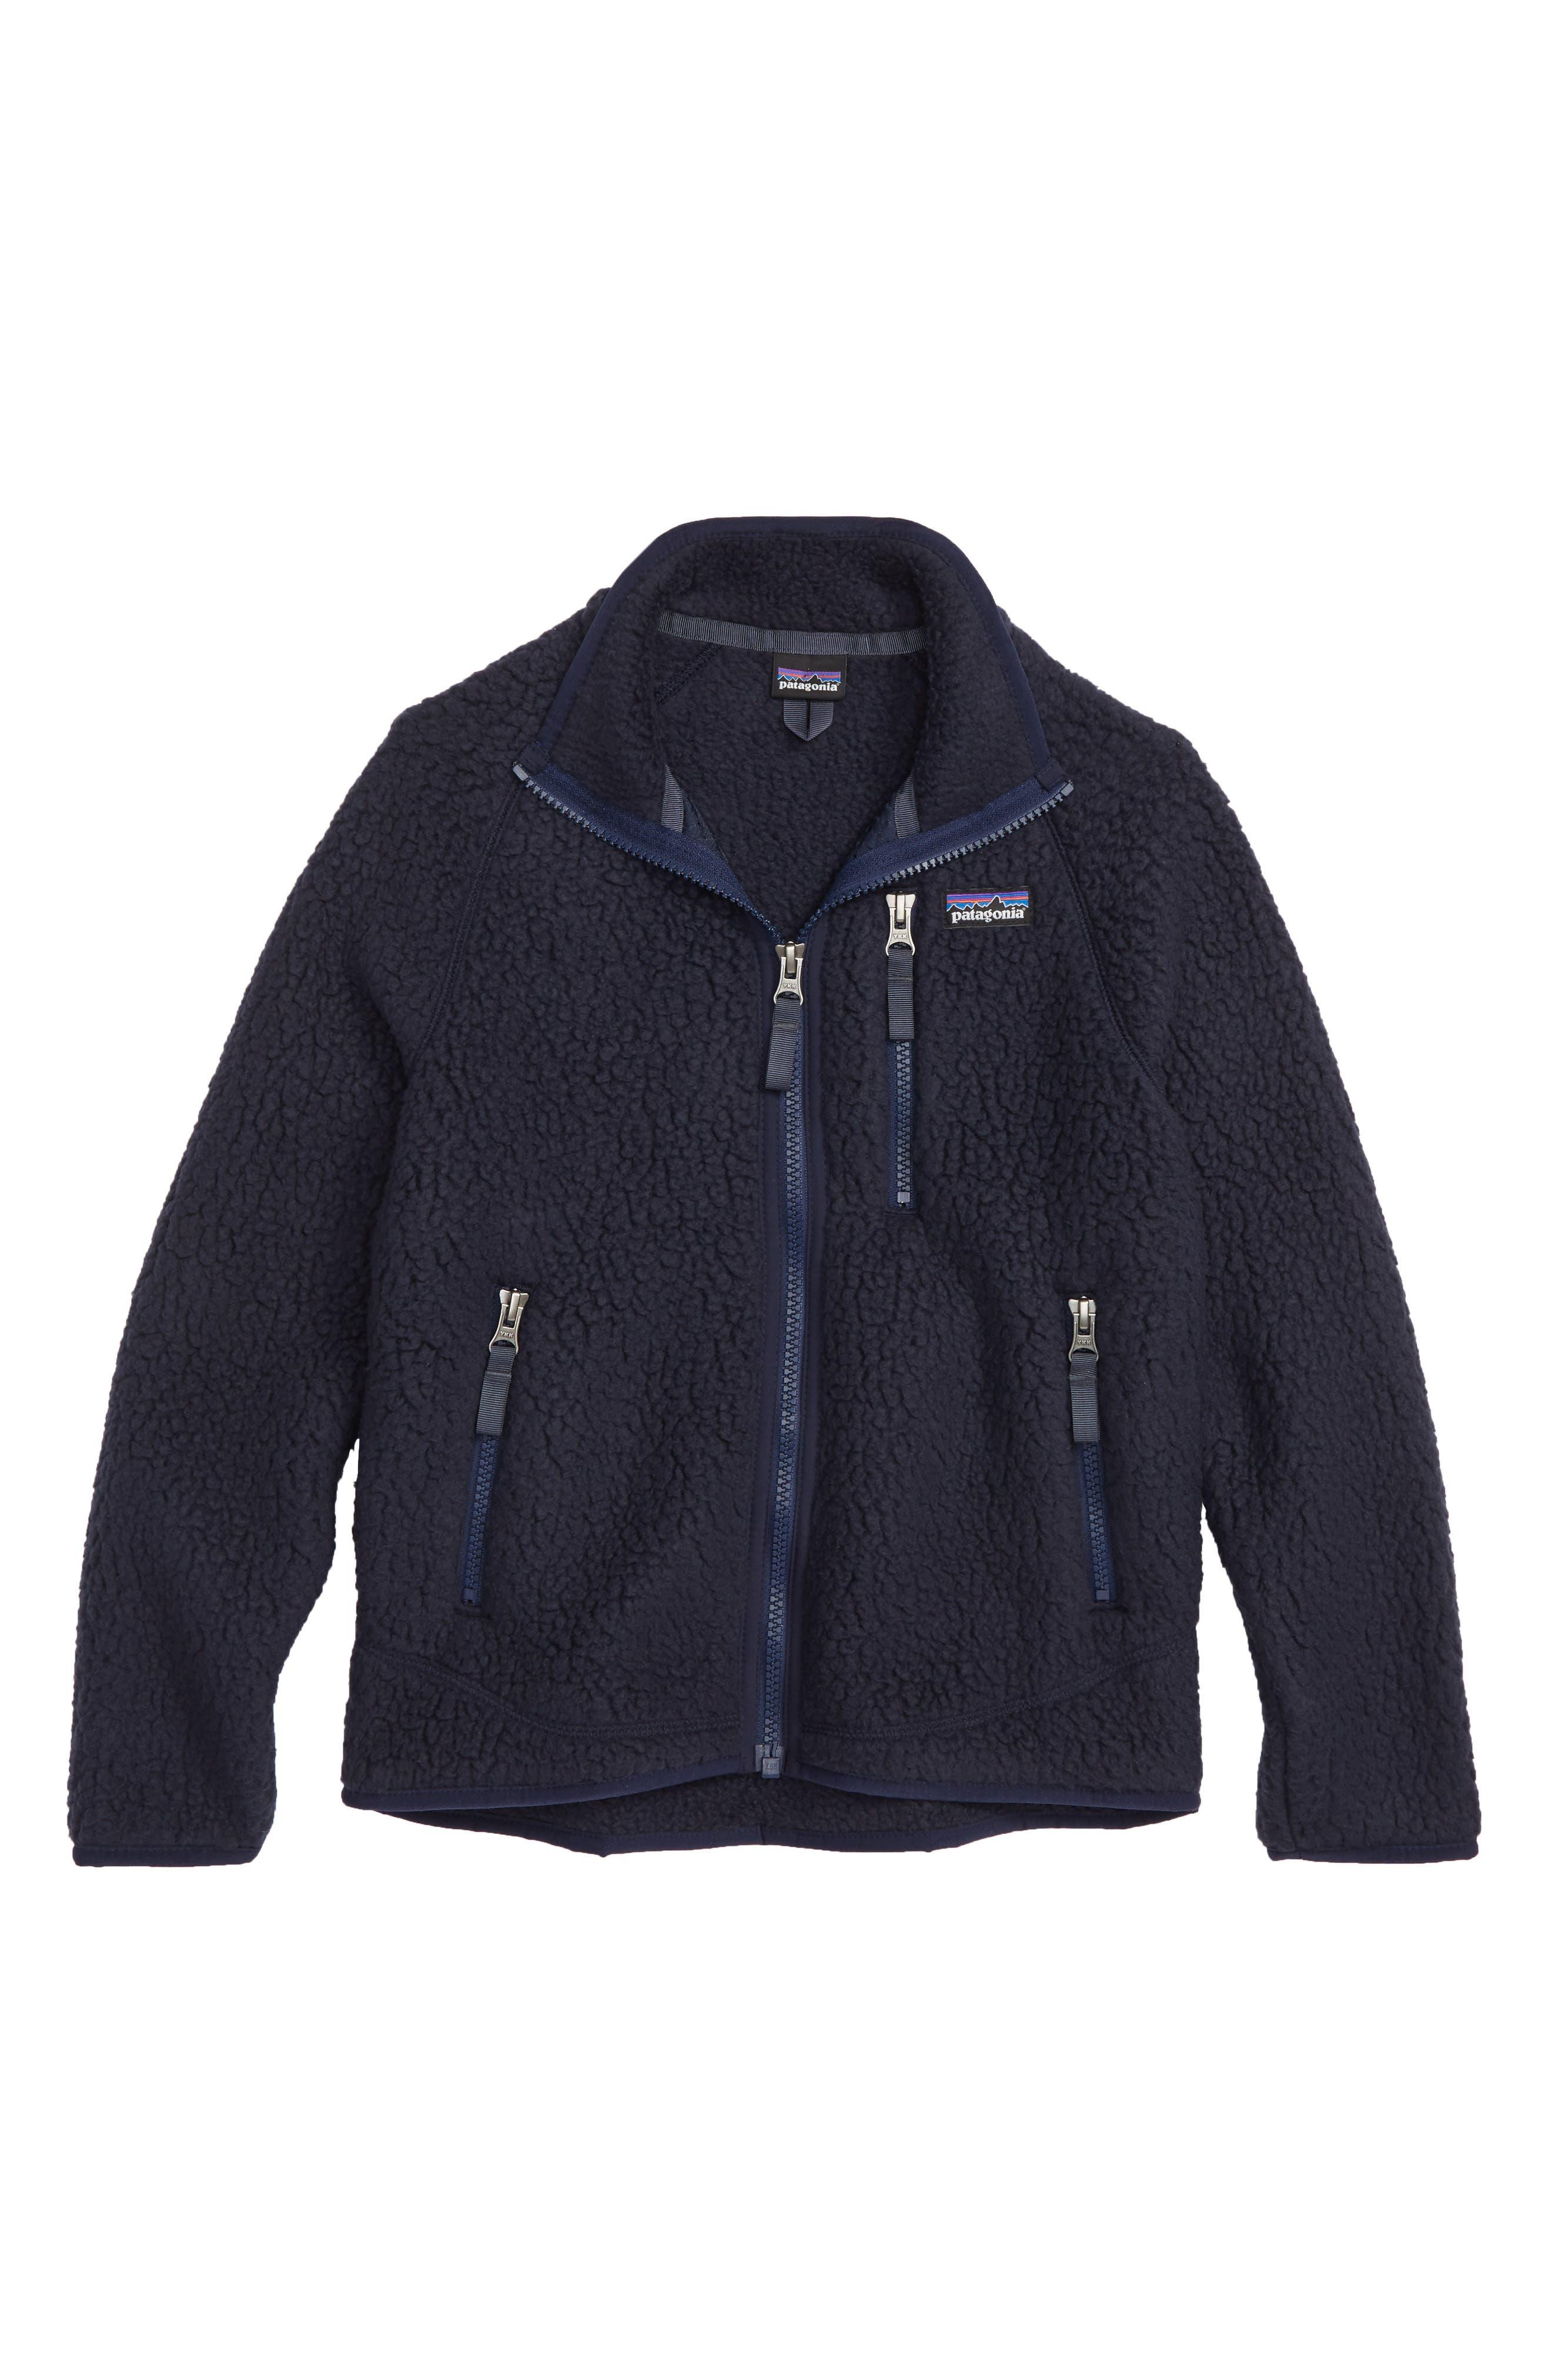 Retro Pile Faux Shearling Jacket,                             Main thumbnail 1, color,                             NAVY